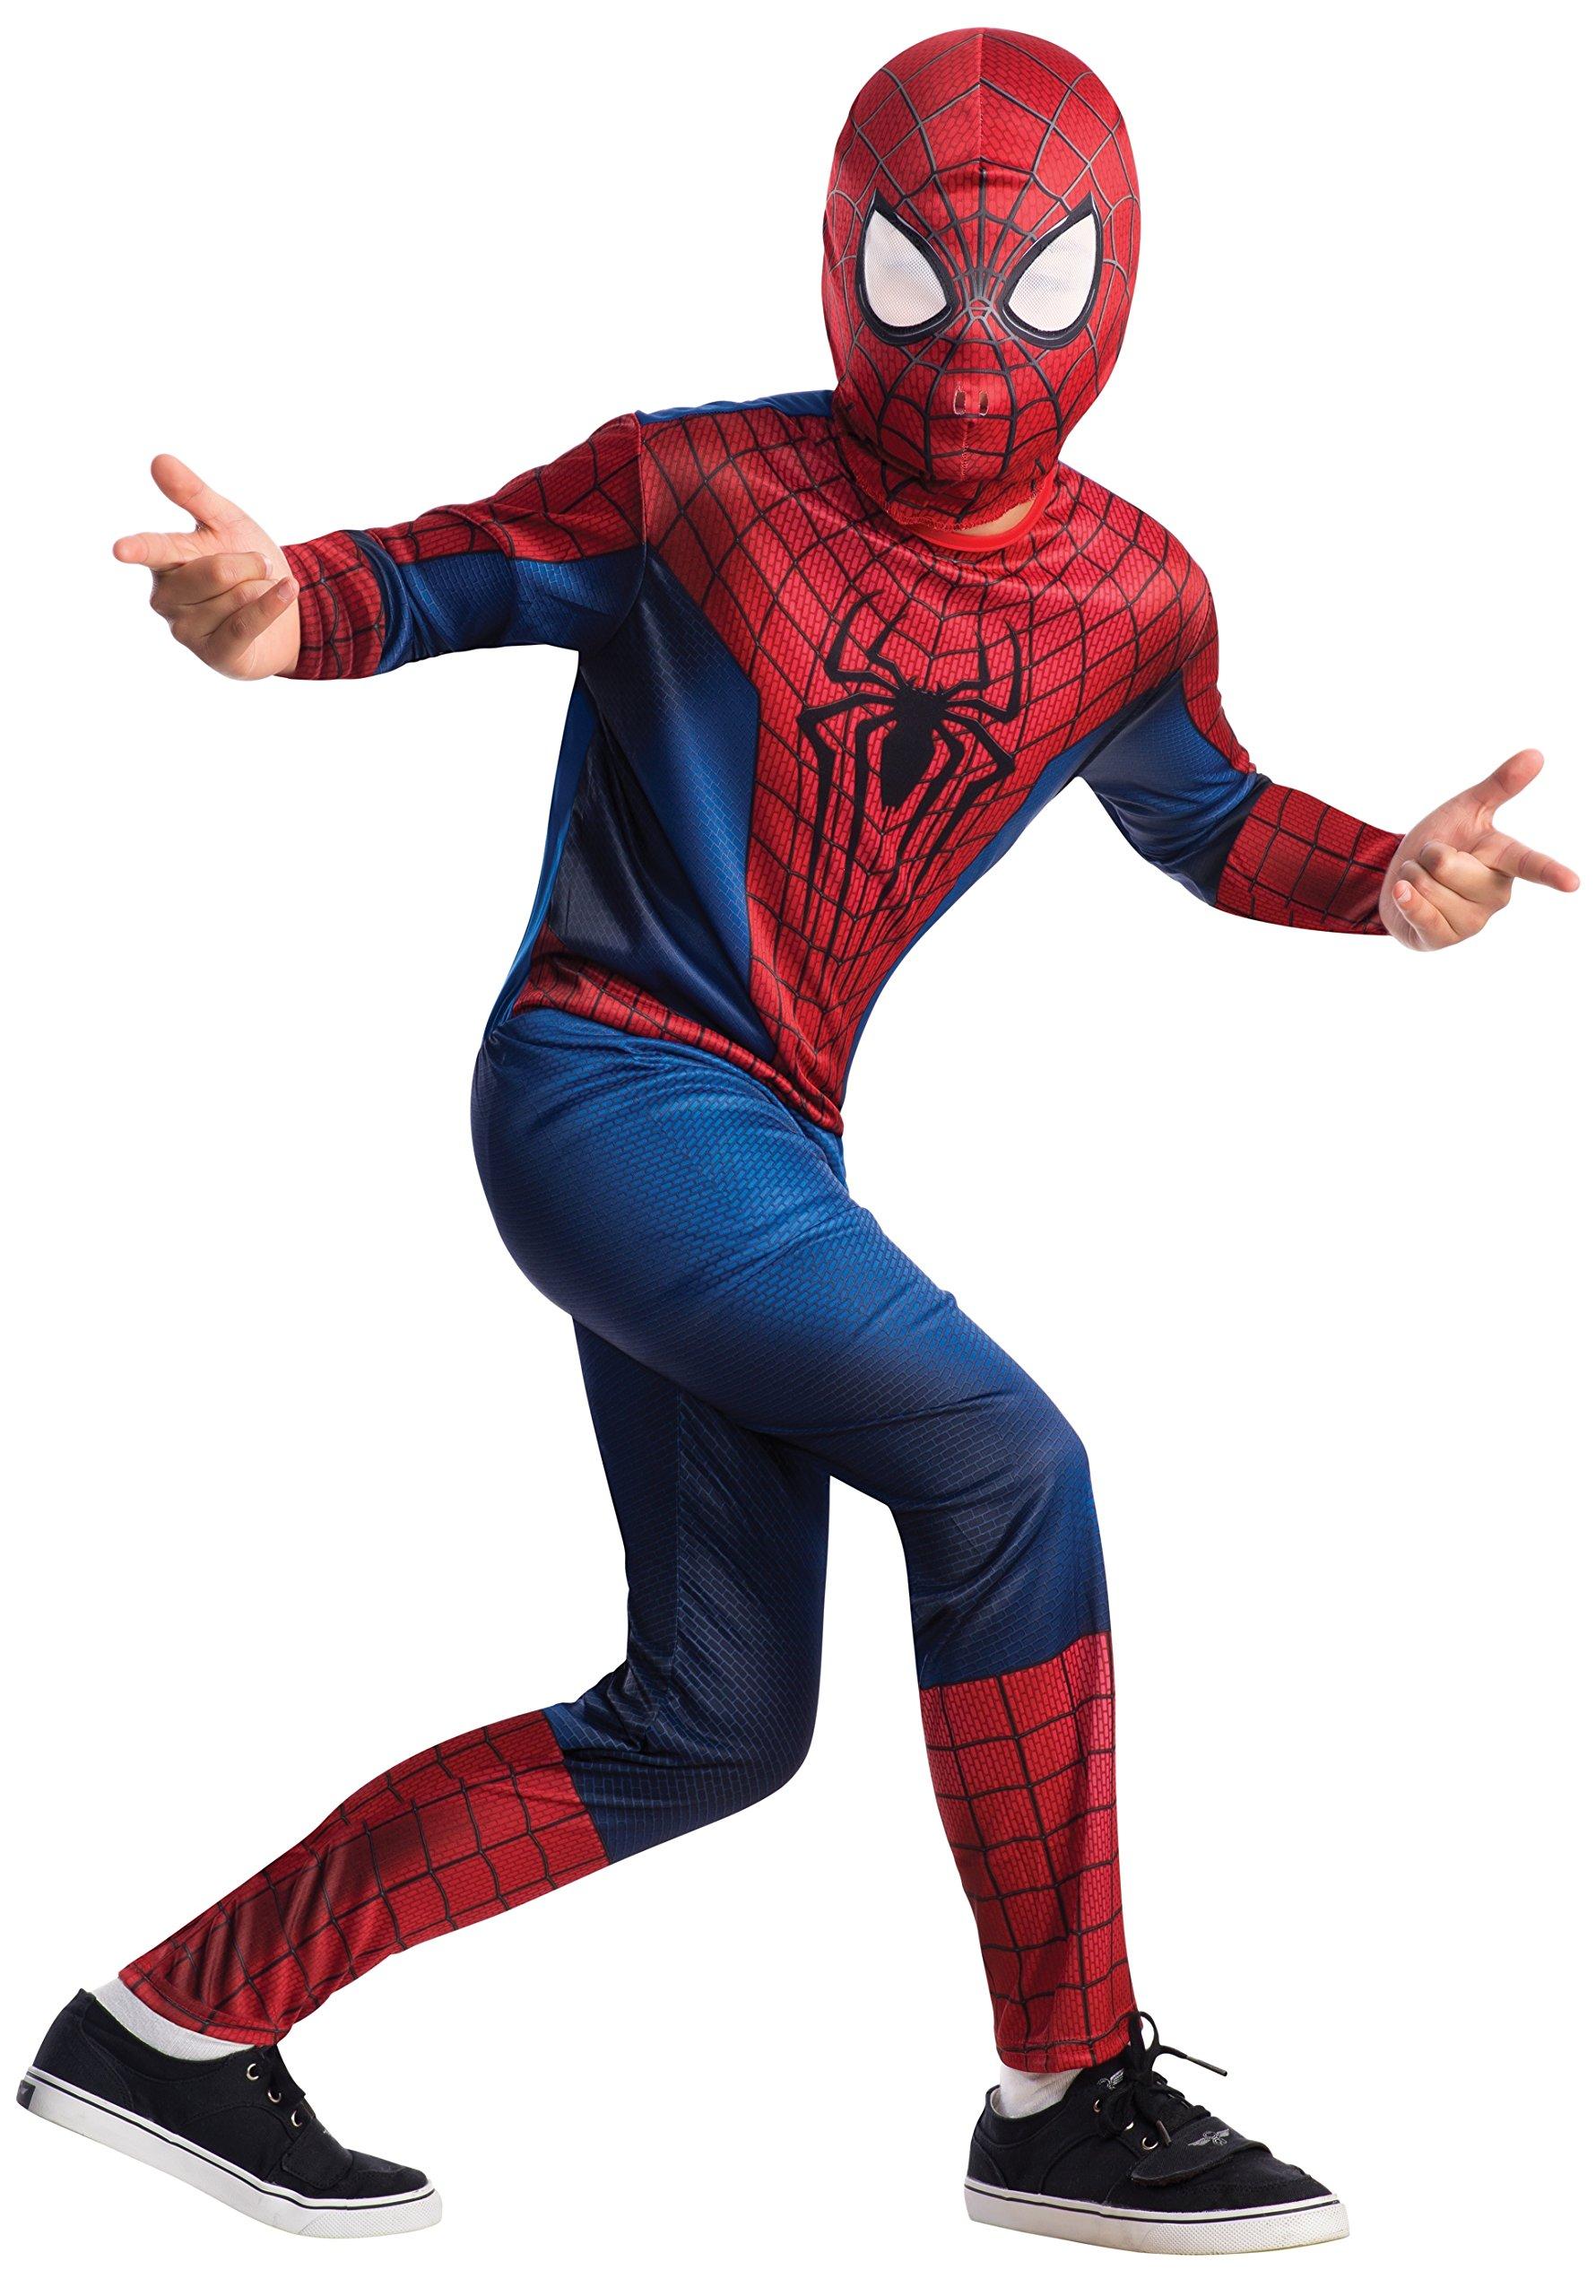 The Amazing Spider-man 2, Spider-man Value Costume, Child Small